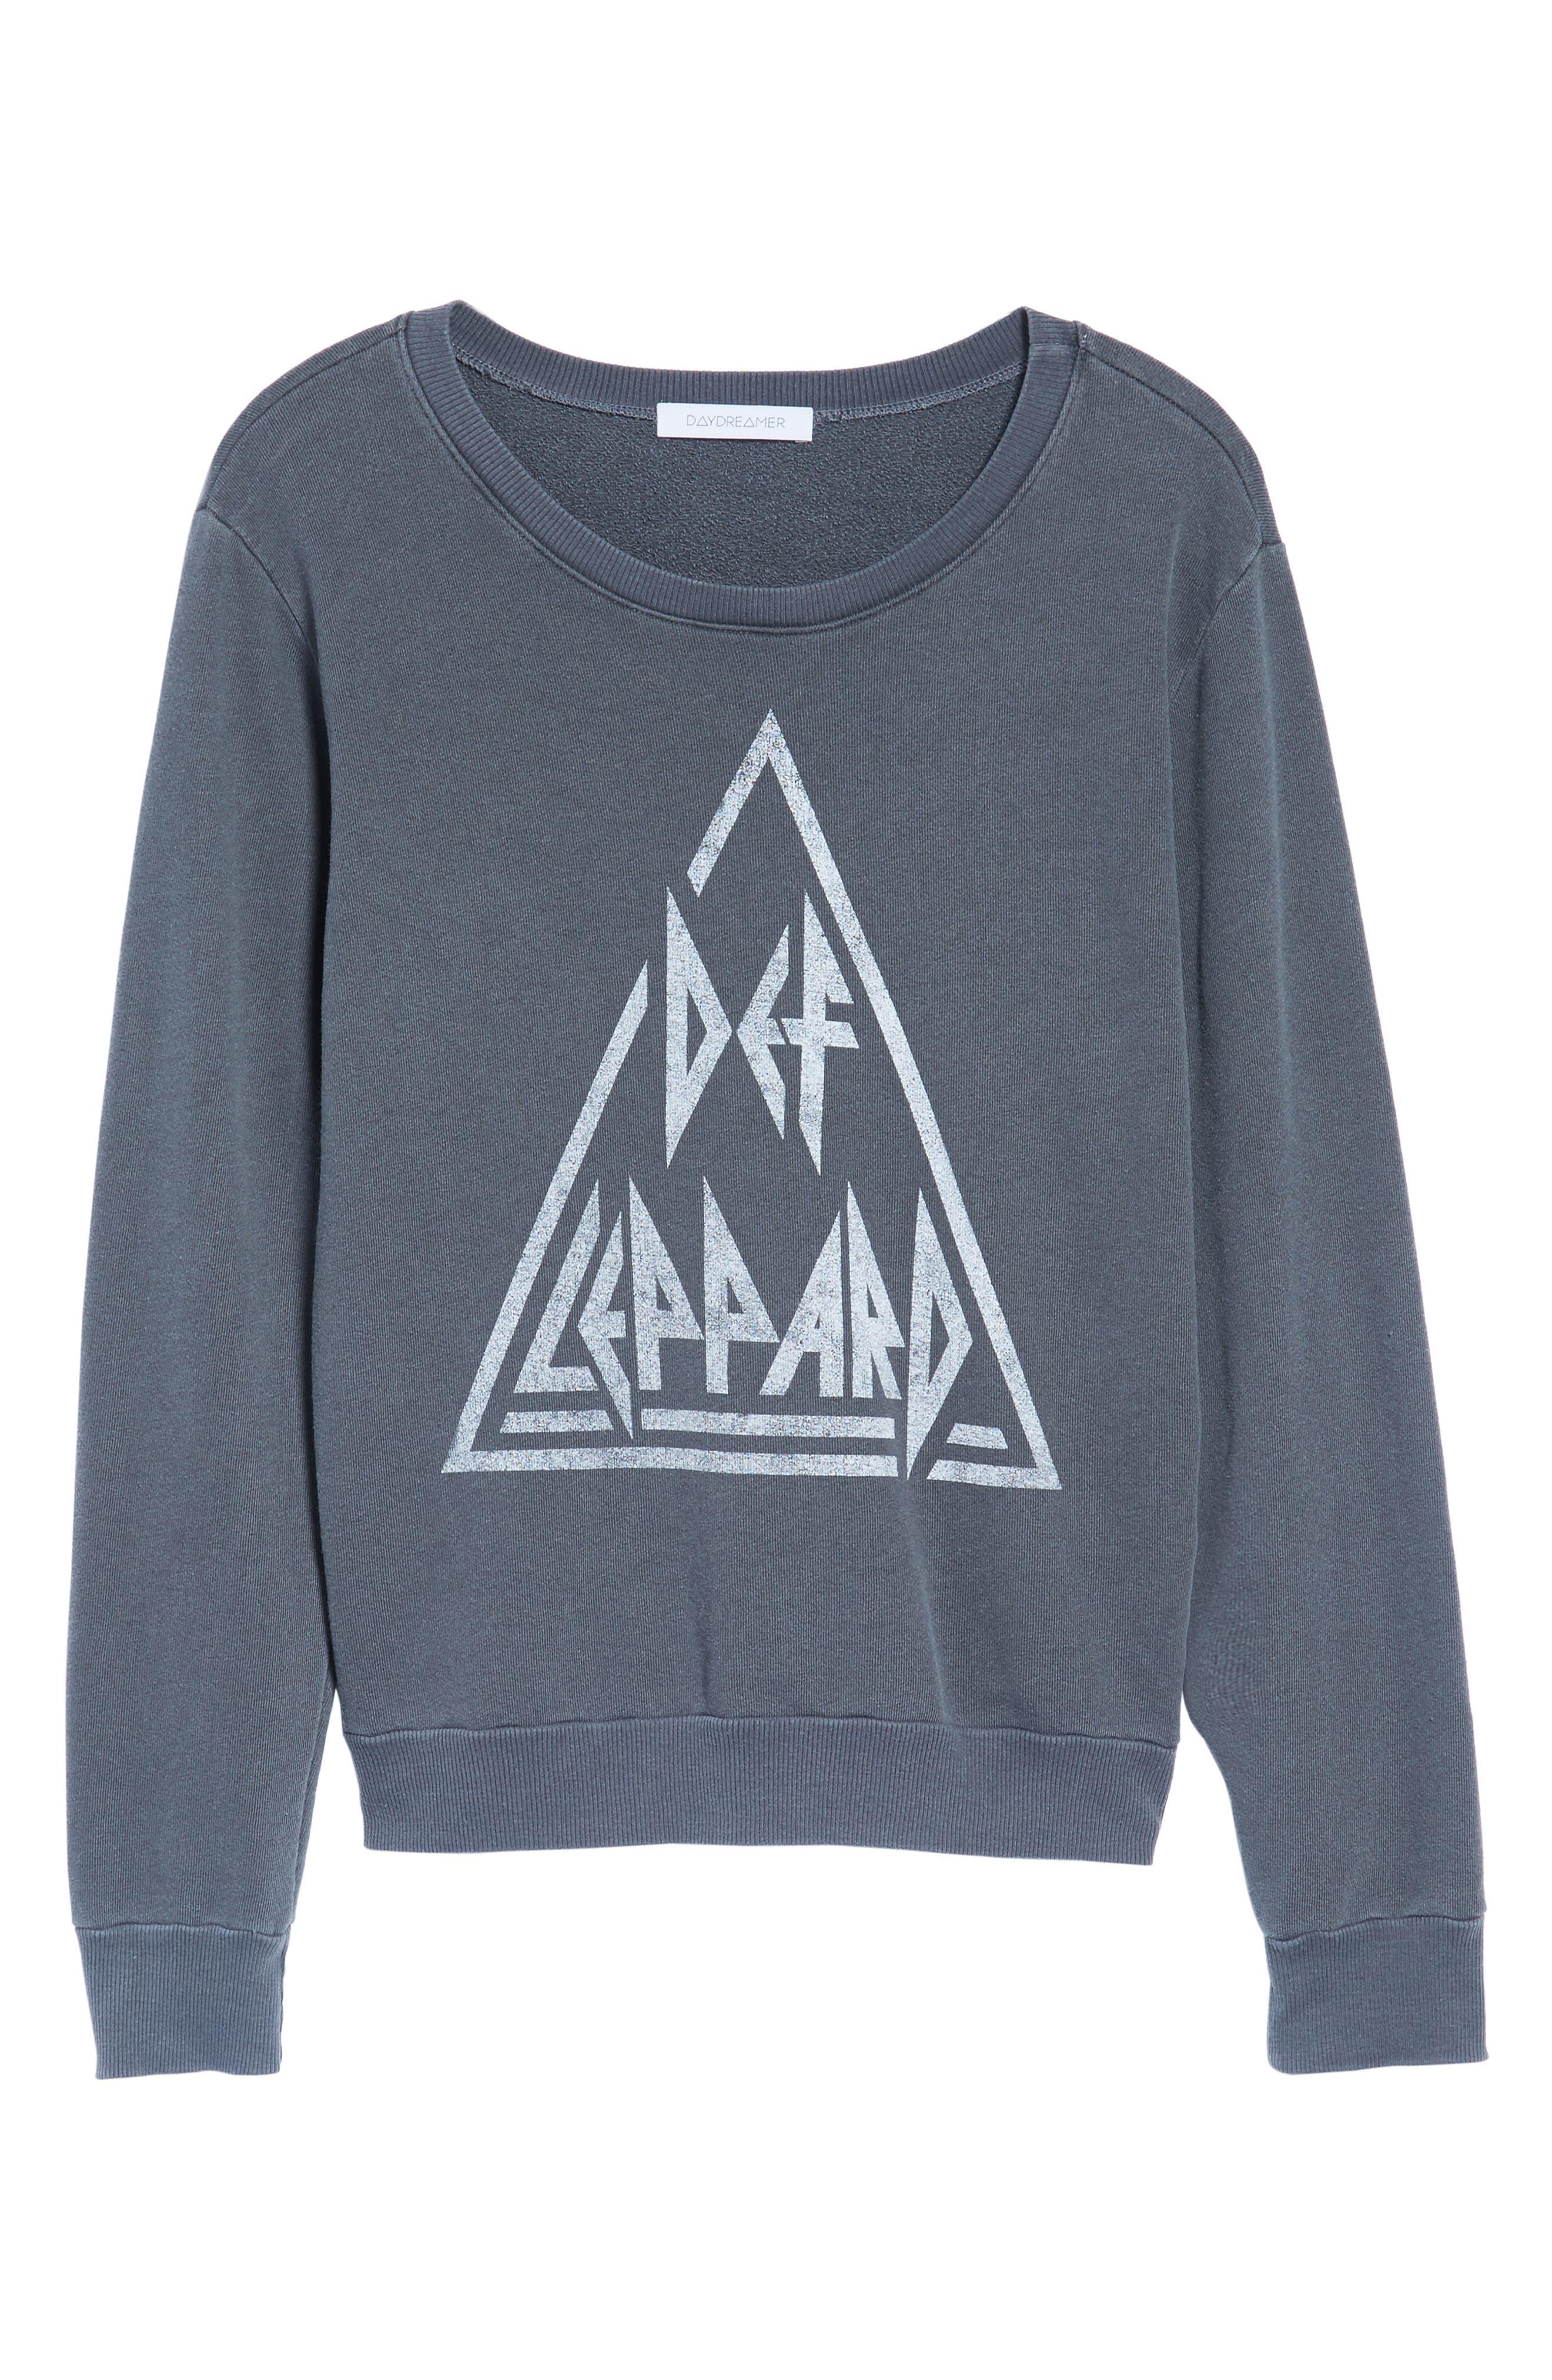 Def Leppard Sweatshirt,                             Alternate thumbnail 6, color,                             001